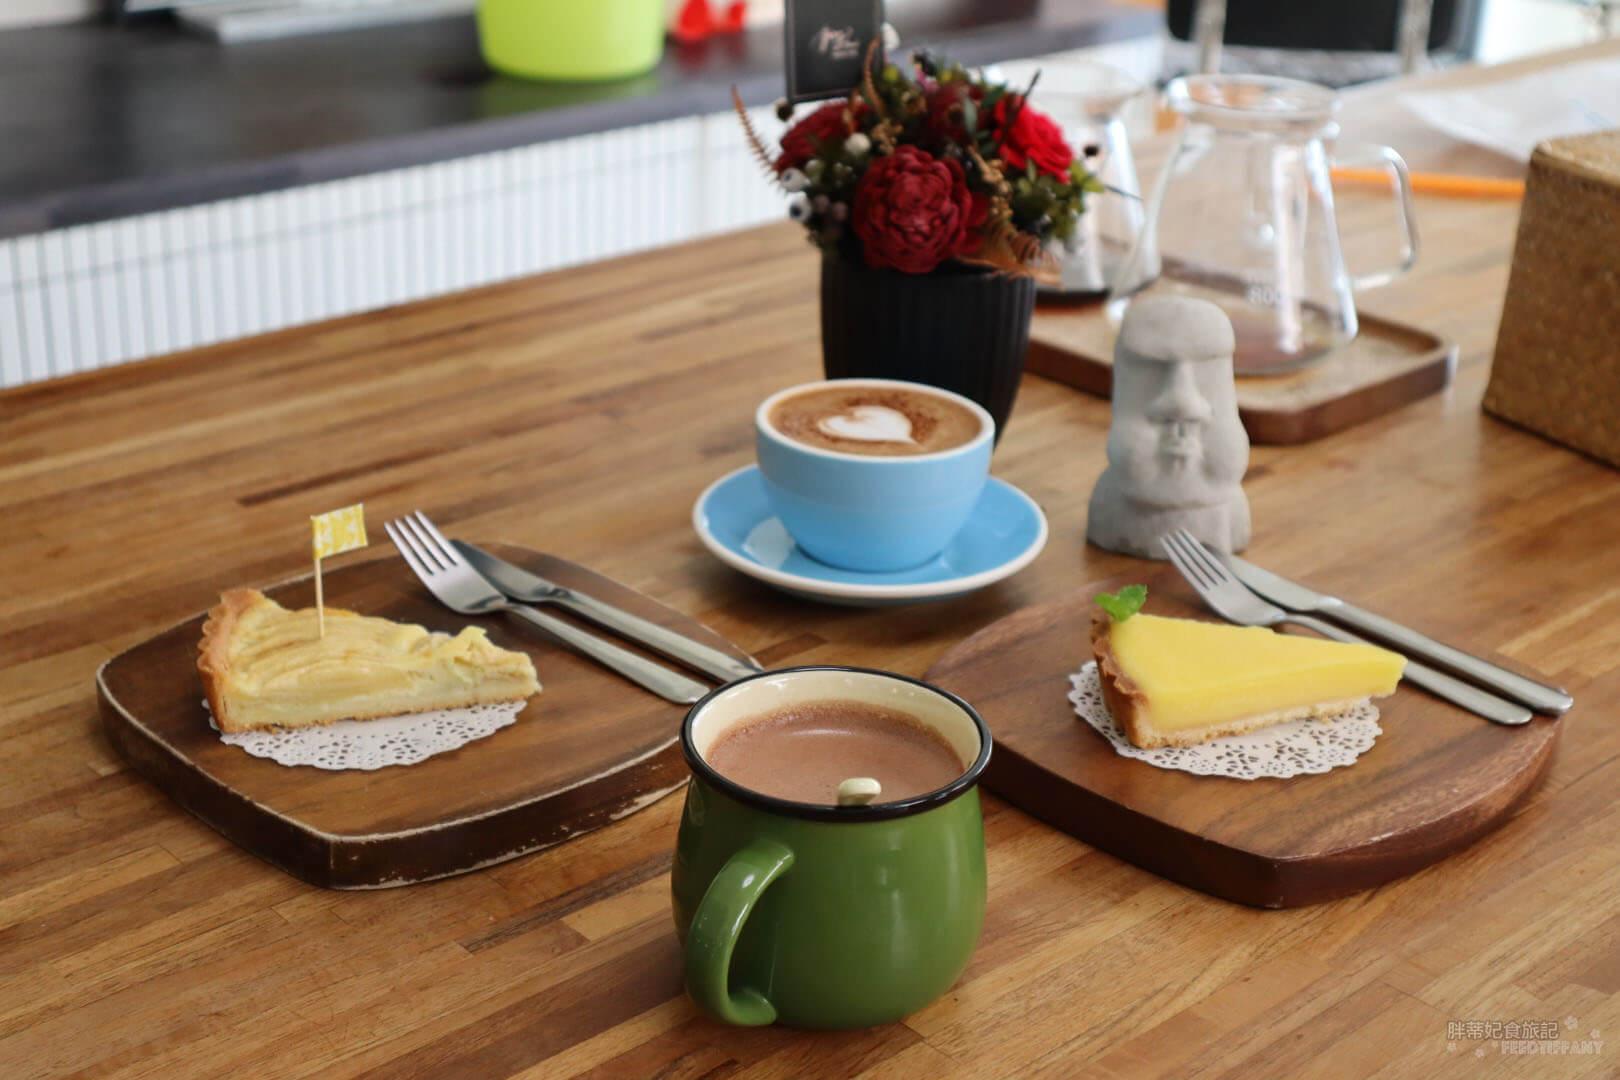 Twi A錘子咖啡烘焙坊 的甜點與咖啡的合照